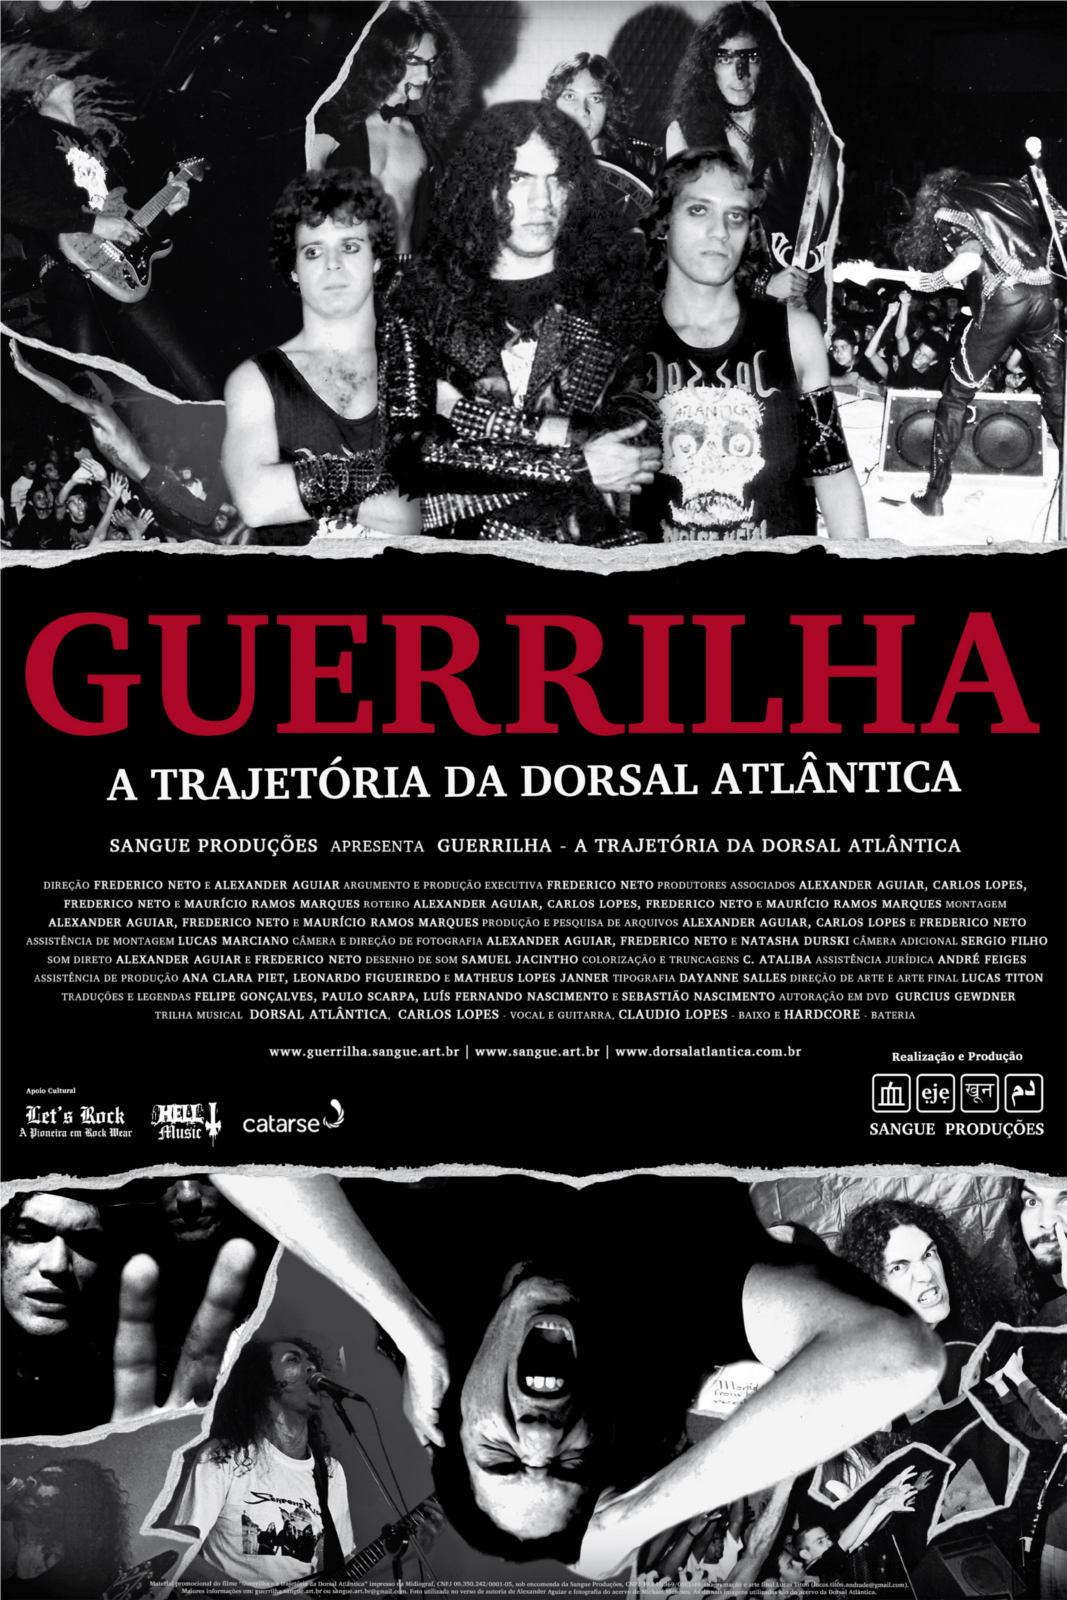 guerrilha-cartaz-email